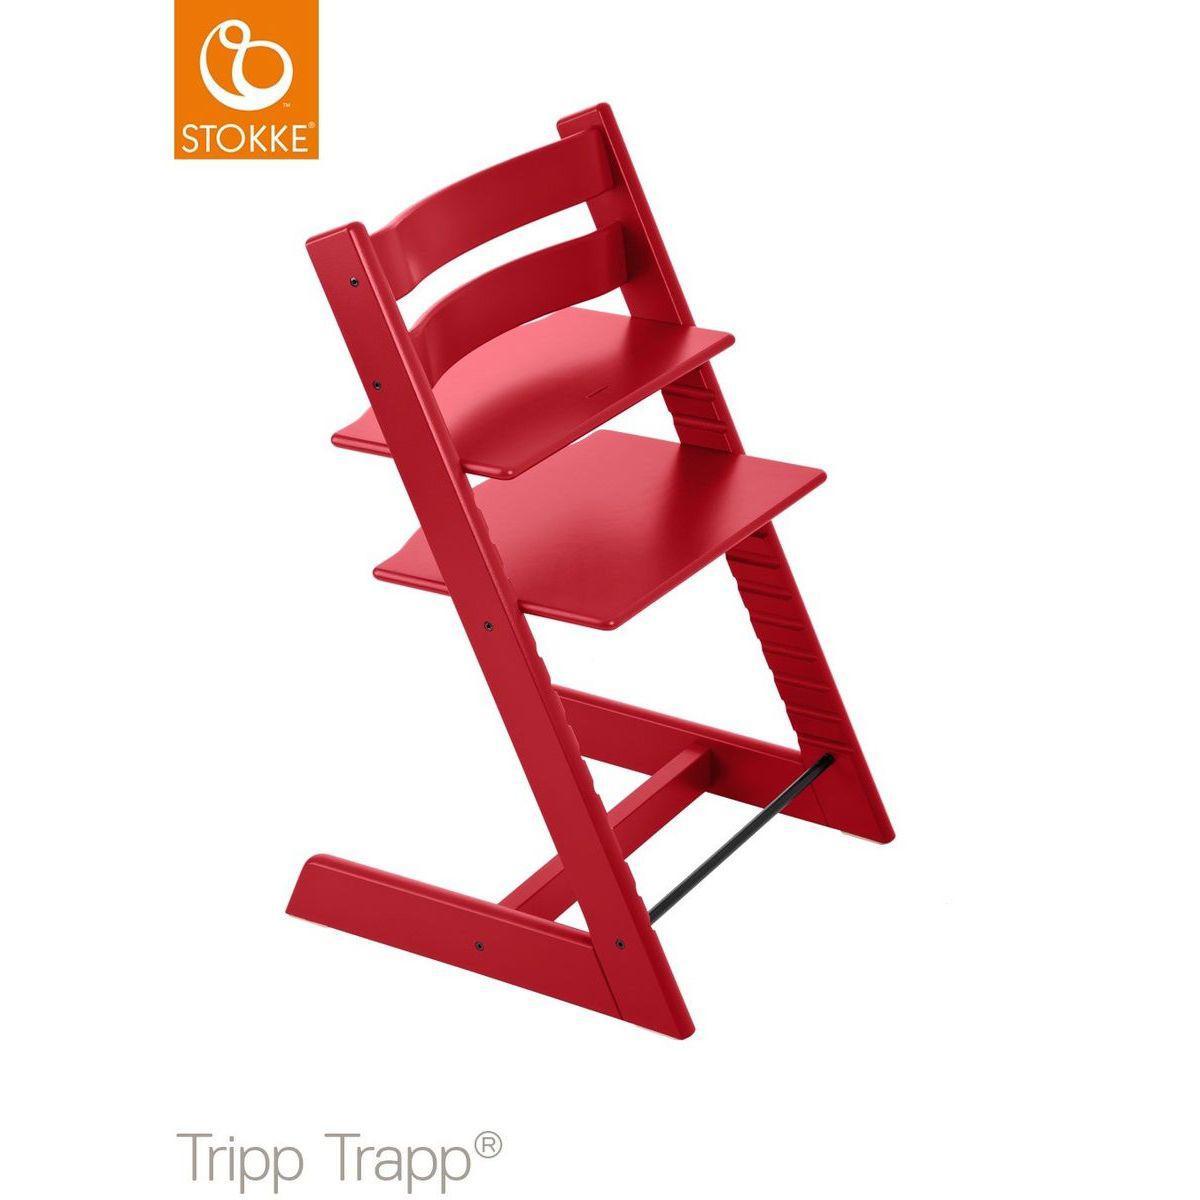 Trona bebé TRIPP TRAPP Stokke rojo